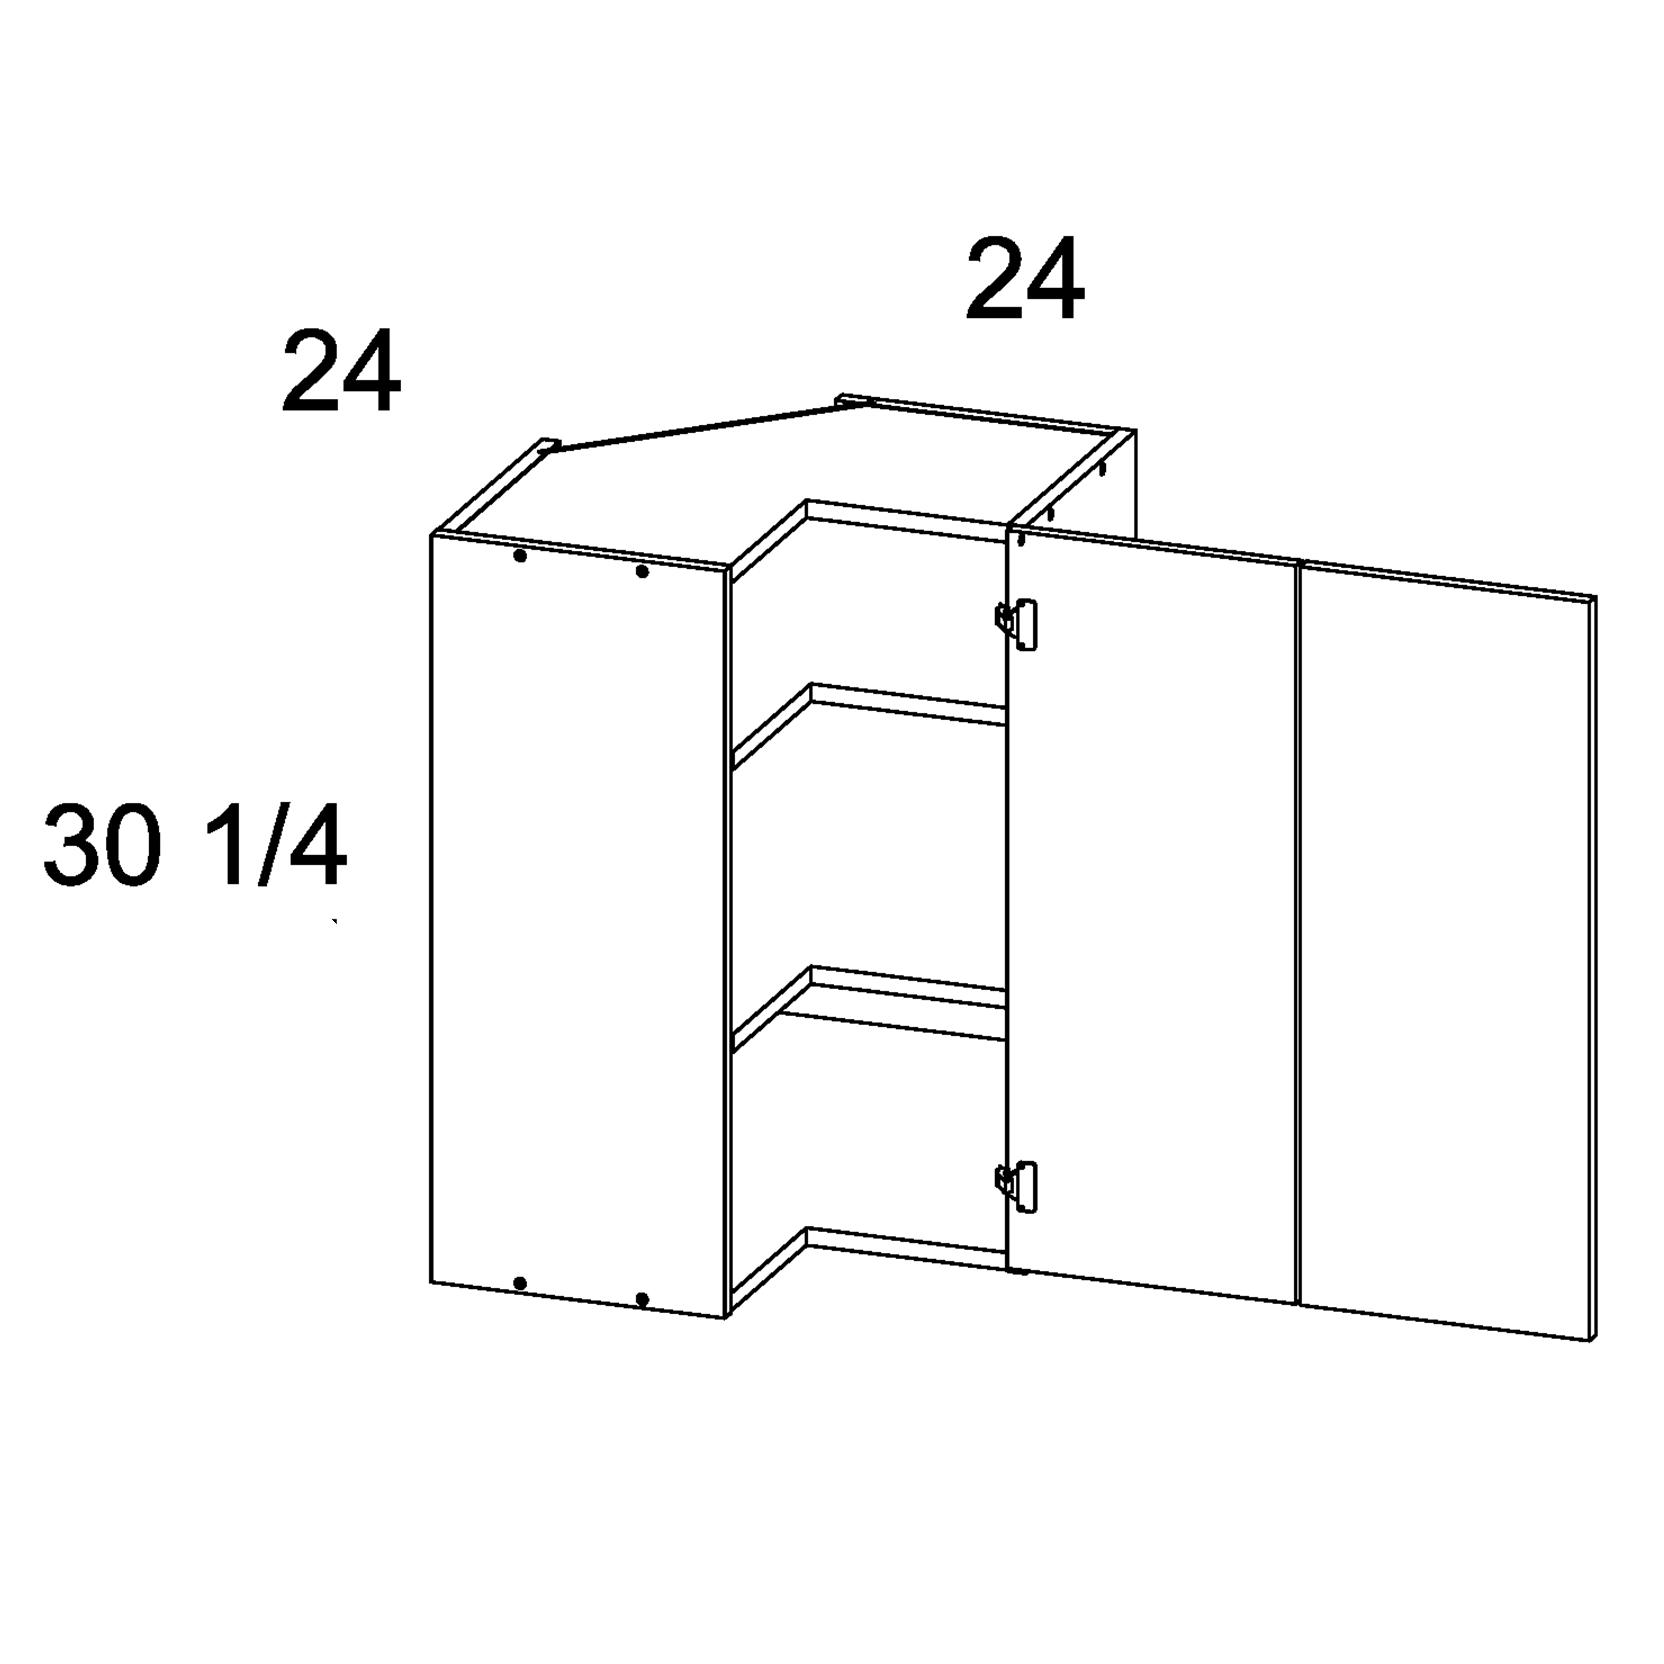 Cabinets, US Cabinet Depot Torino Dark Wood US Cabinet Depot Easy Reach Wall Corner Cabiner